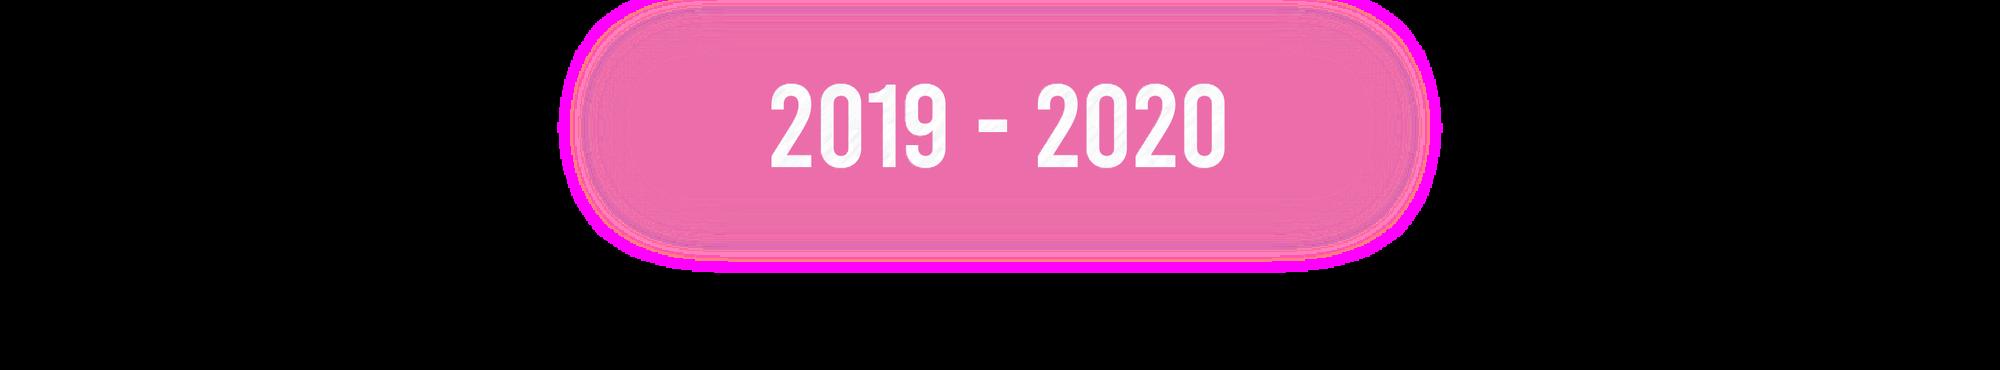 Illustratie_2019_-_2020.png